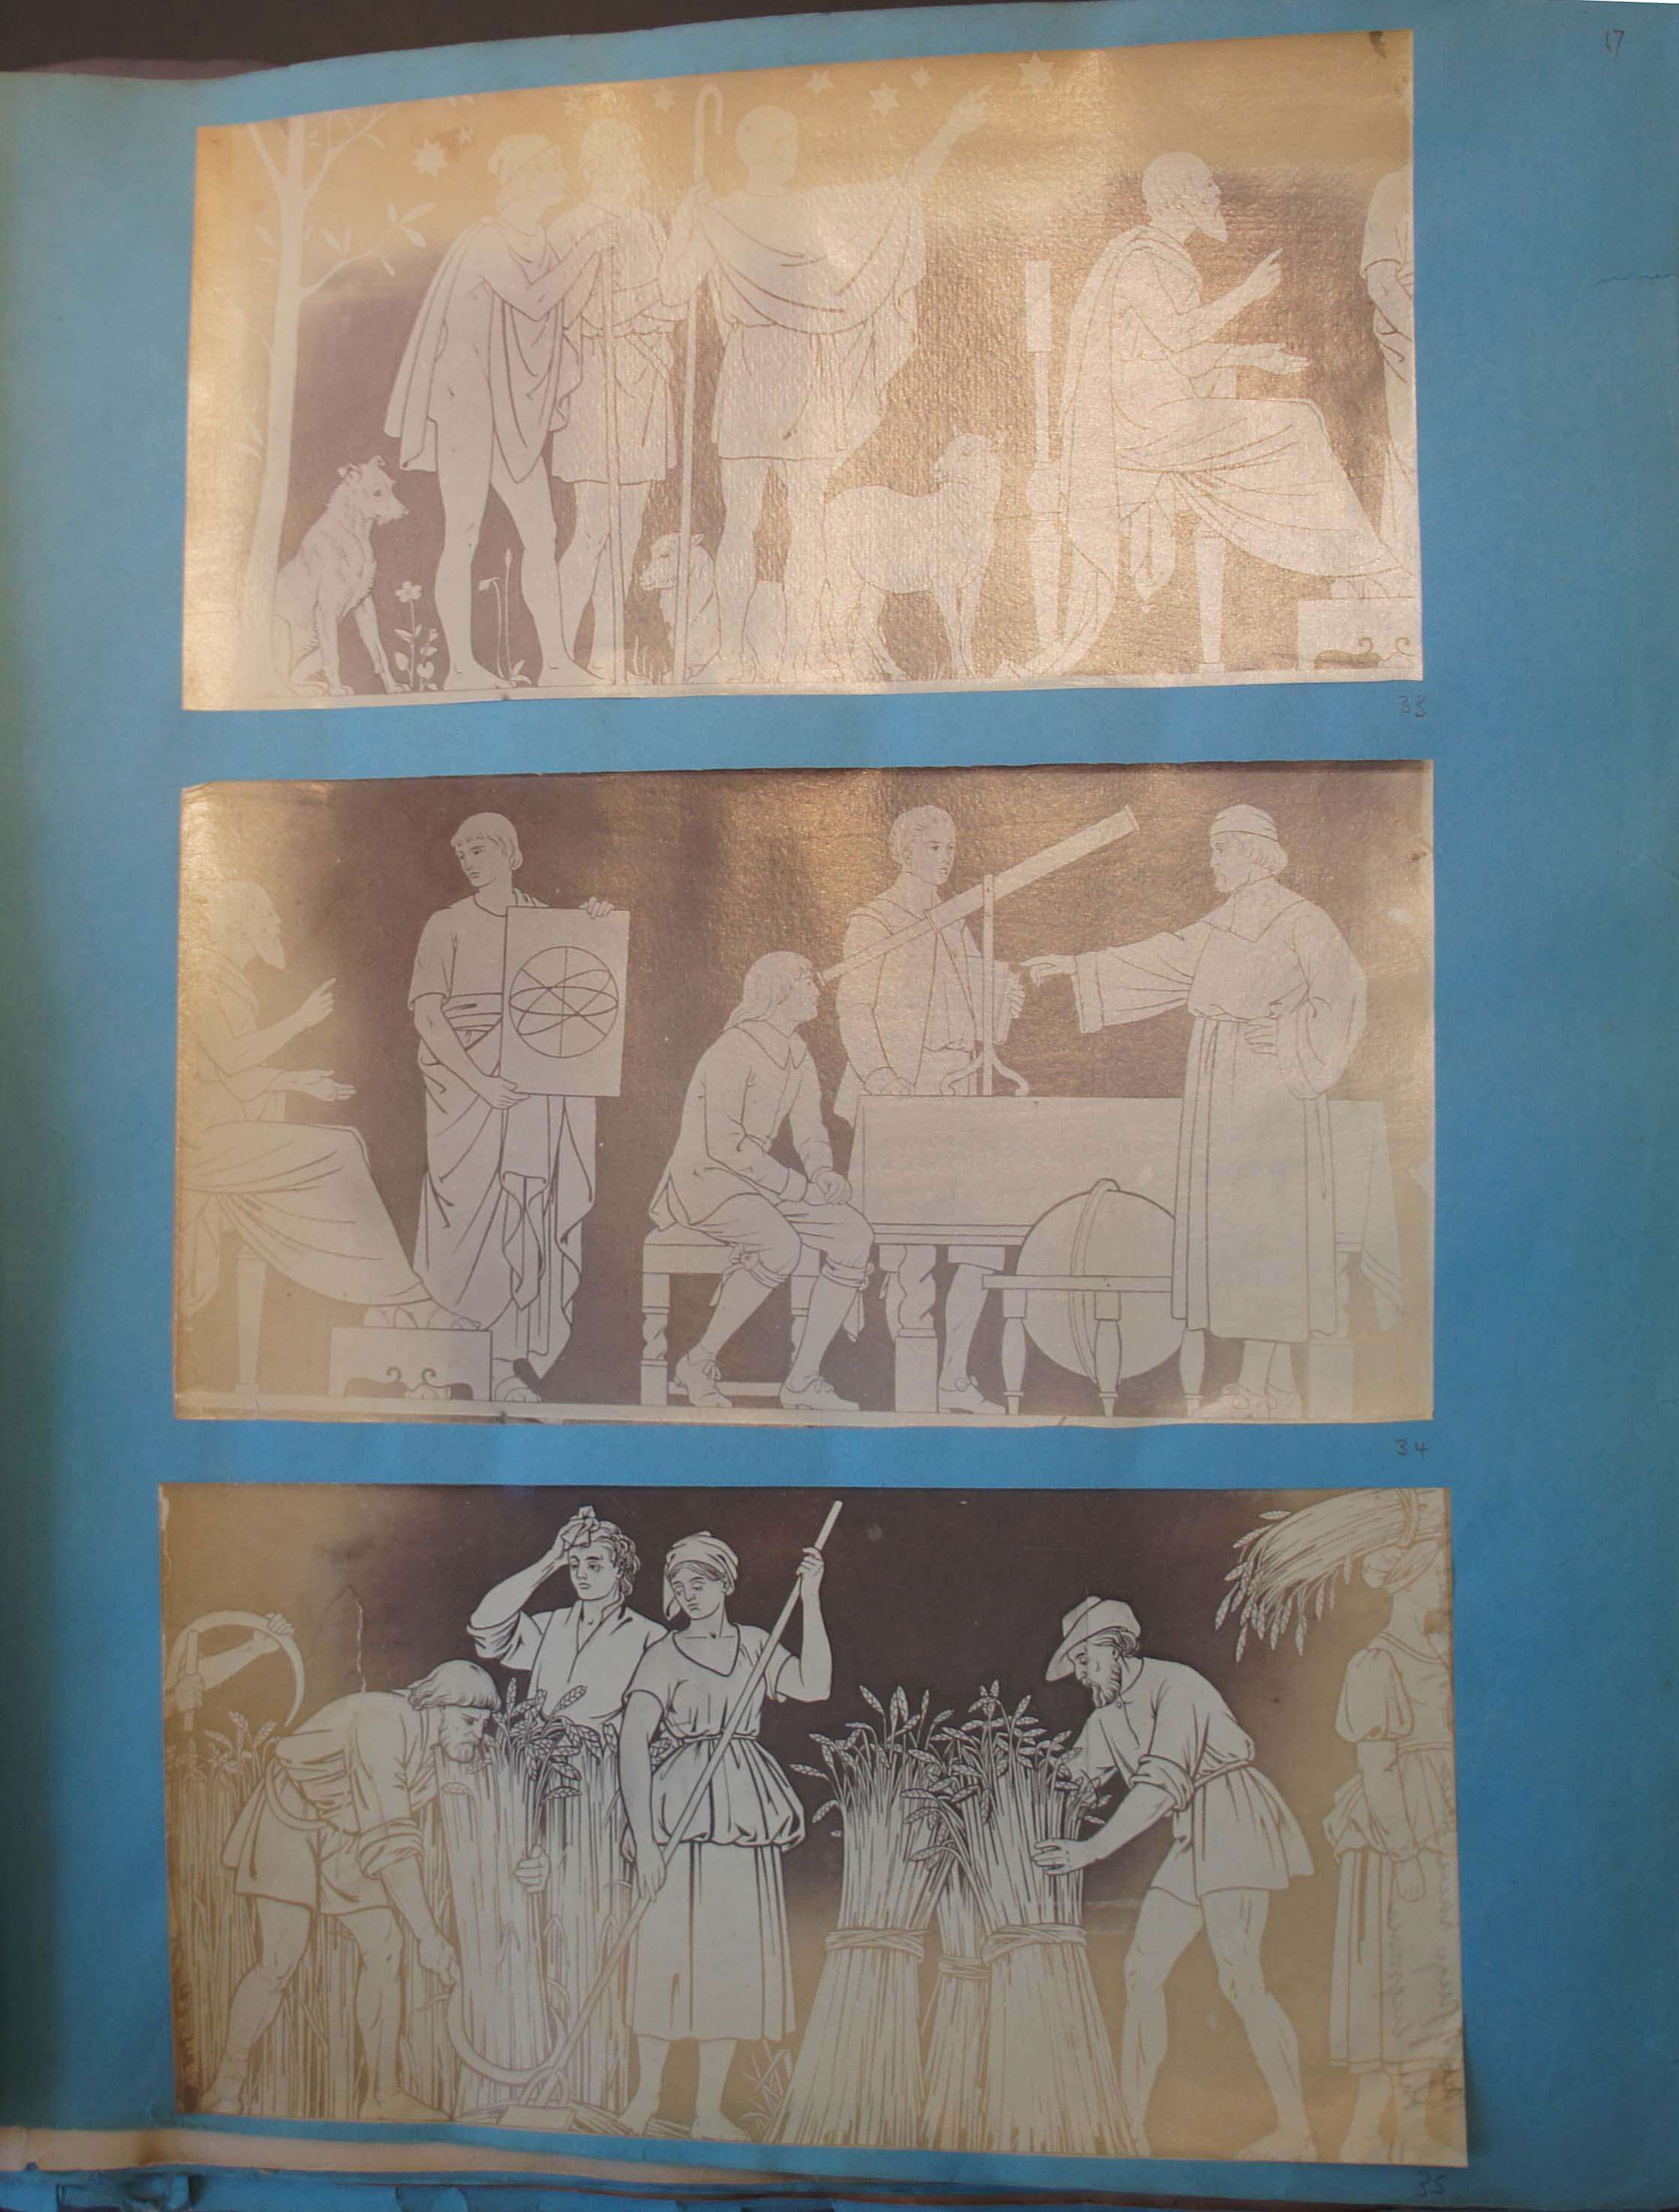 Photographs of the artist's drawings in Benjamin. L. Spackman scrapbook